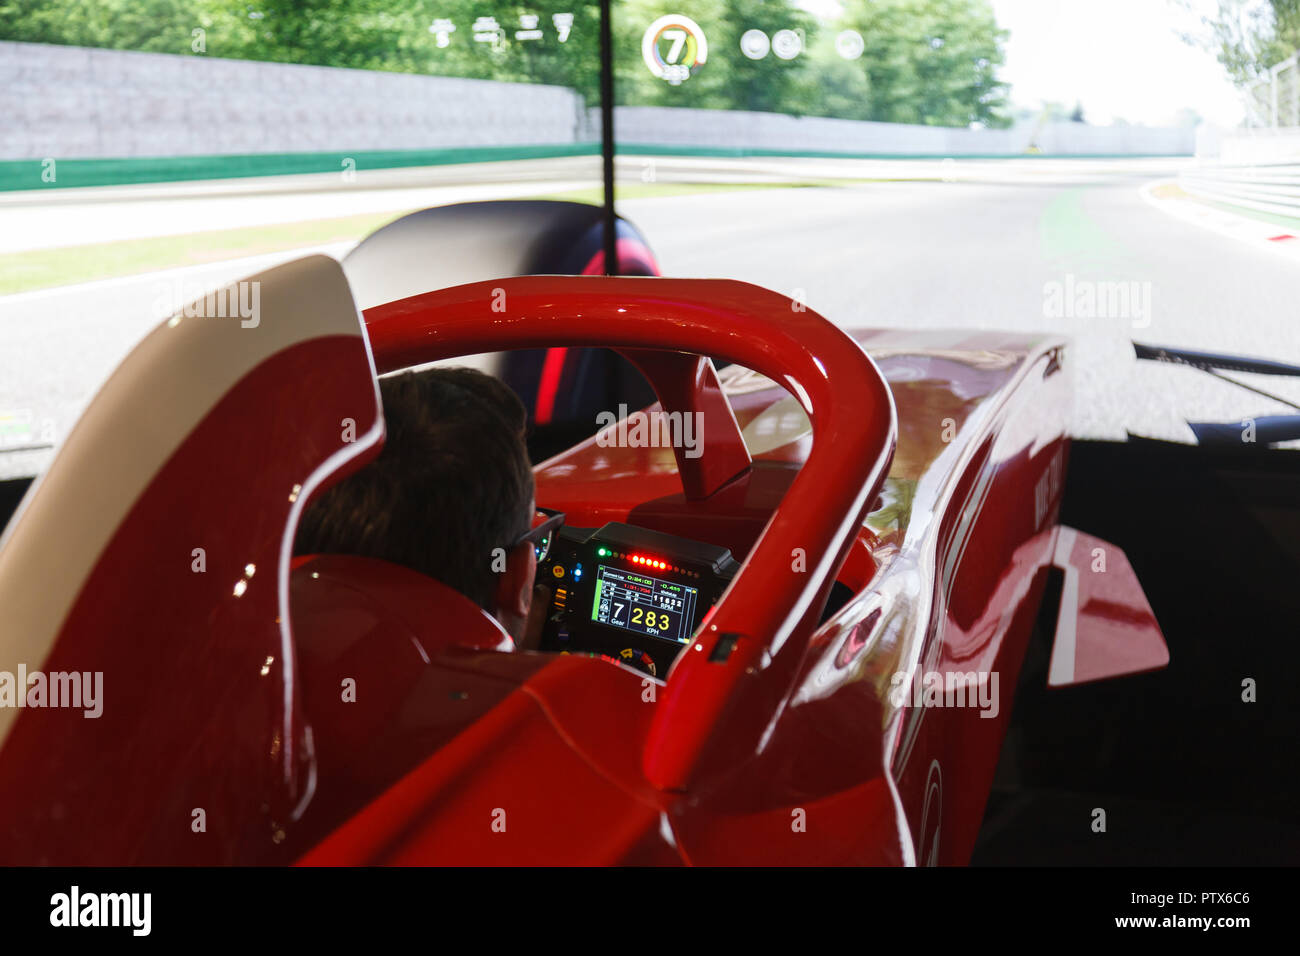 Race Car Simulator Stock Photos & Race Car Simulator Stock Images